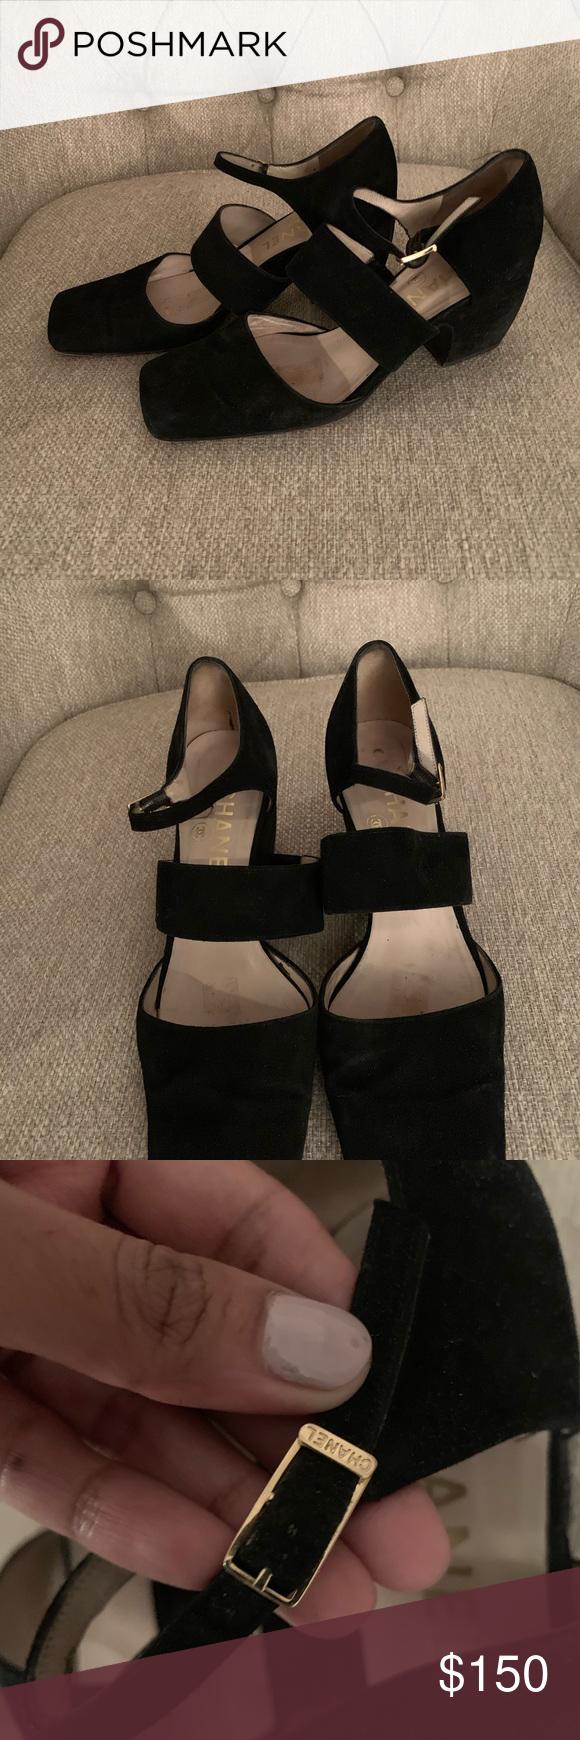 Chanel suede heels size 37 in 2020 Suede heels, Chanel